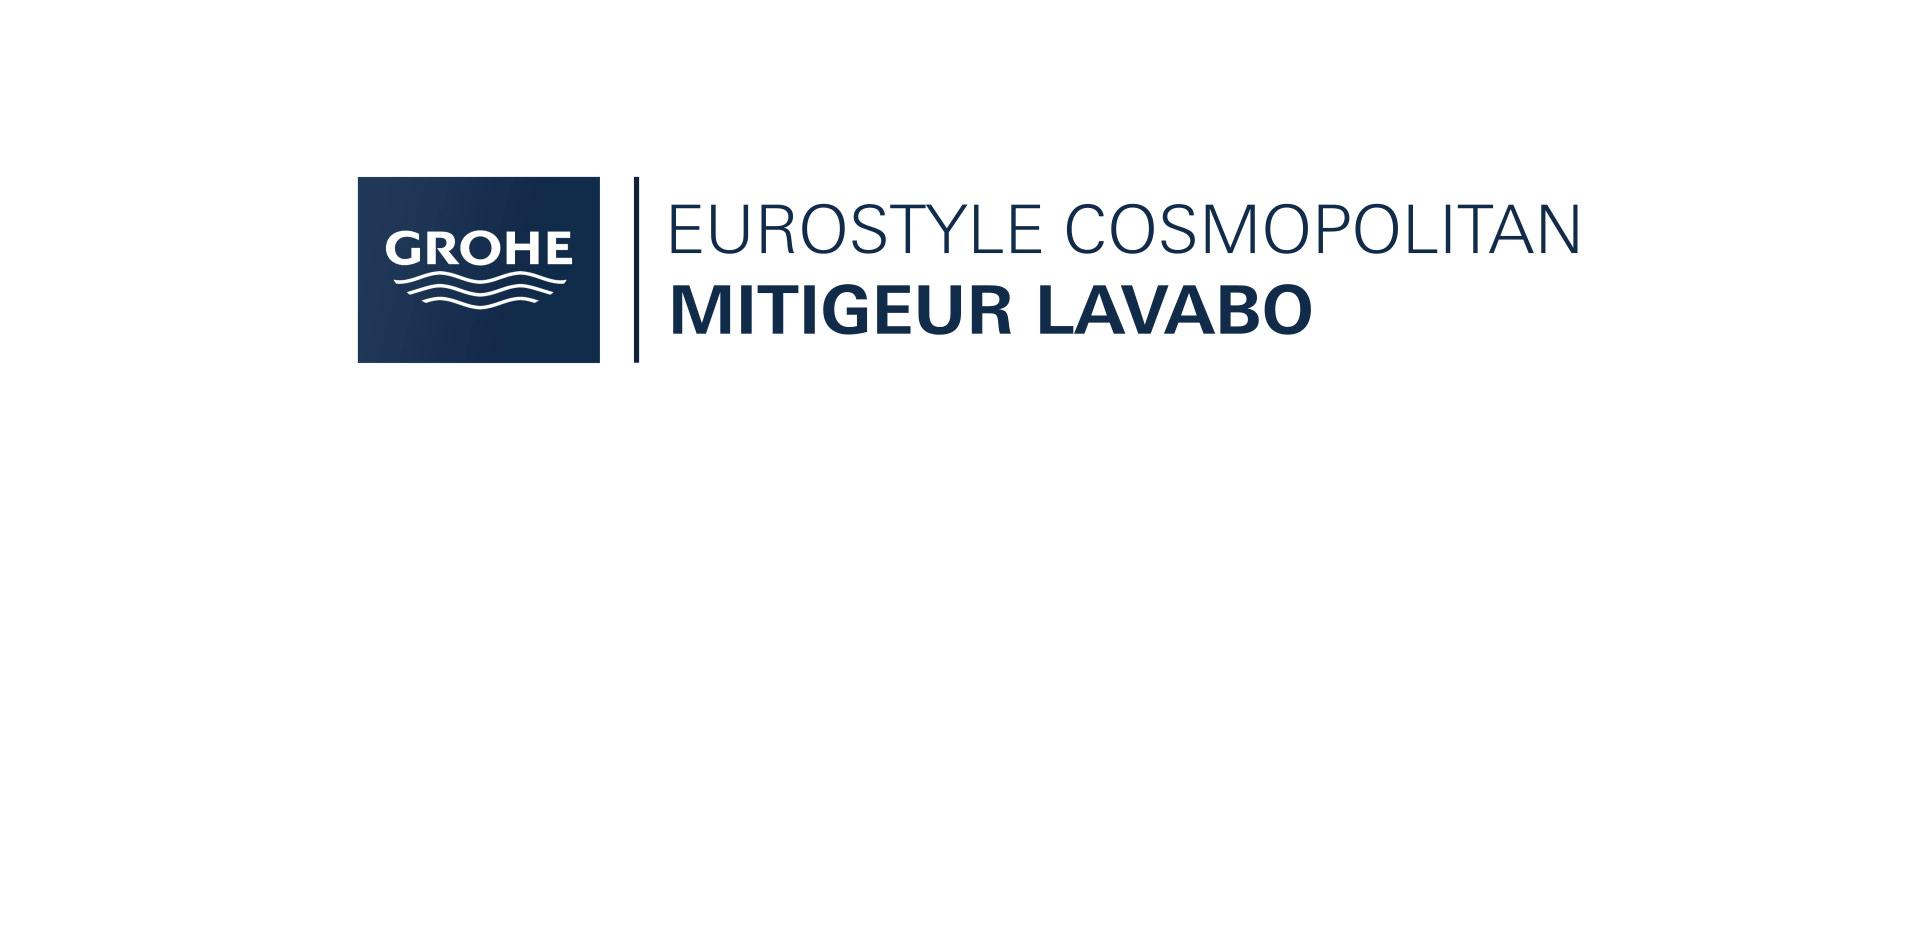 Mitigeur Lavabo Taille S Eurostyle Cosmopolitan Chroméde Grohe